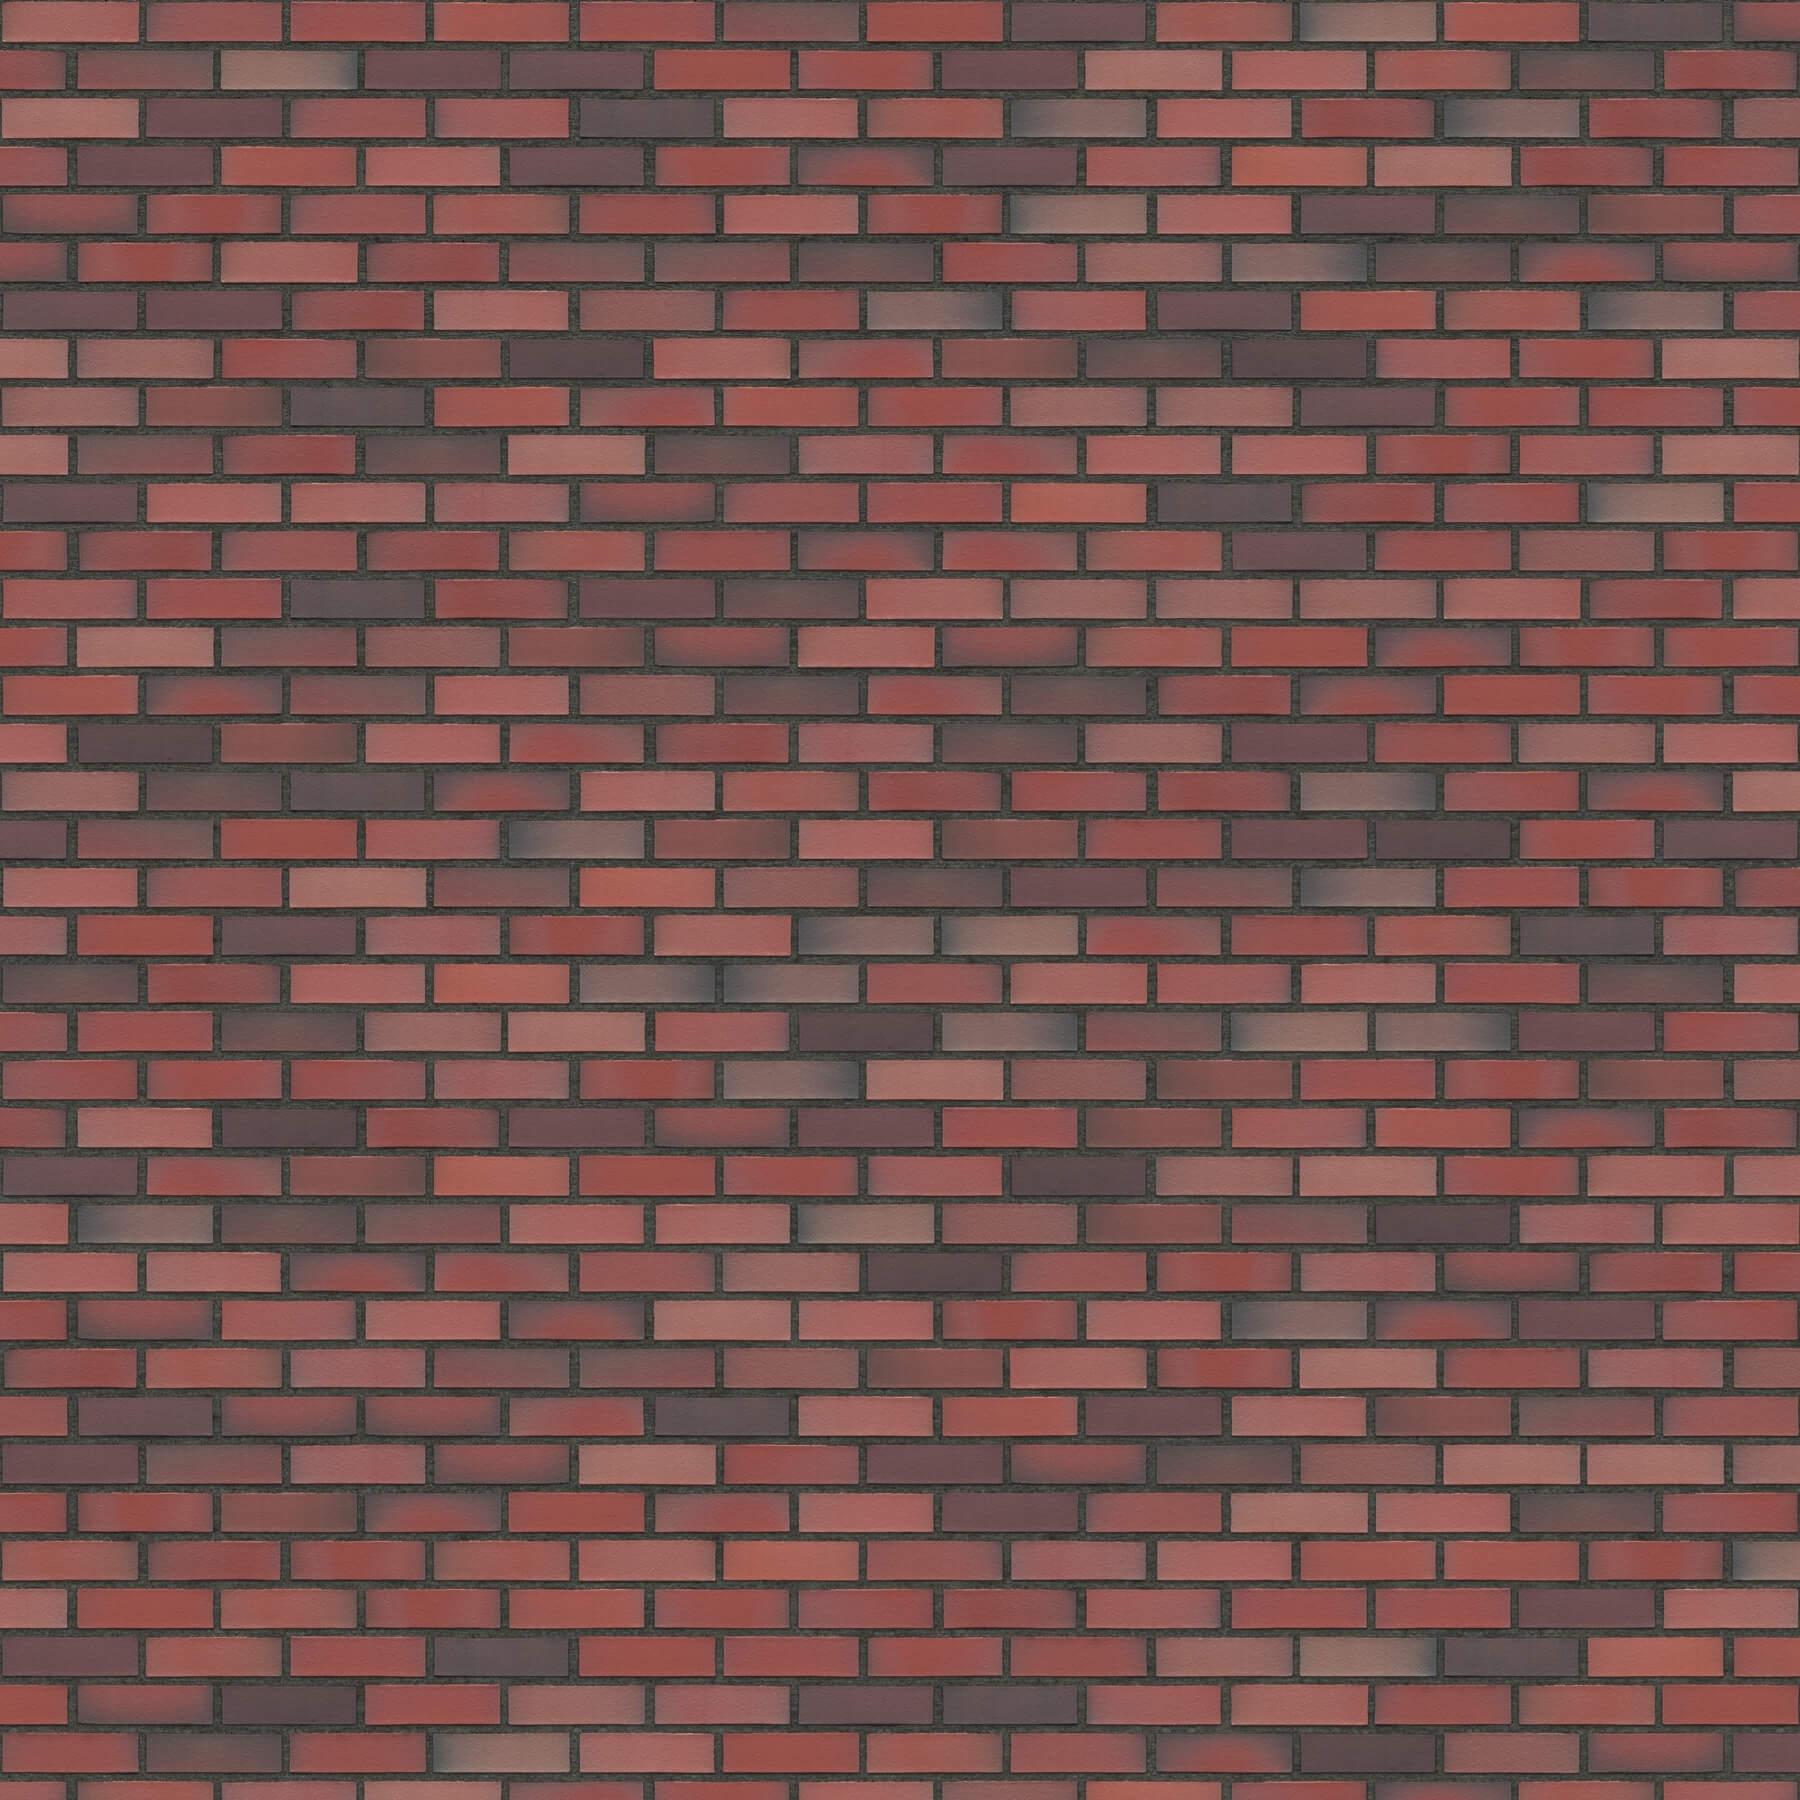 Puna-cigla-Feldhaus-Klinker-brick-house-nf-k-300-Antracit Fuga